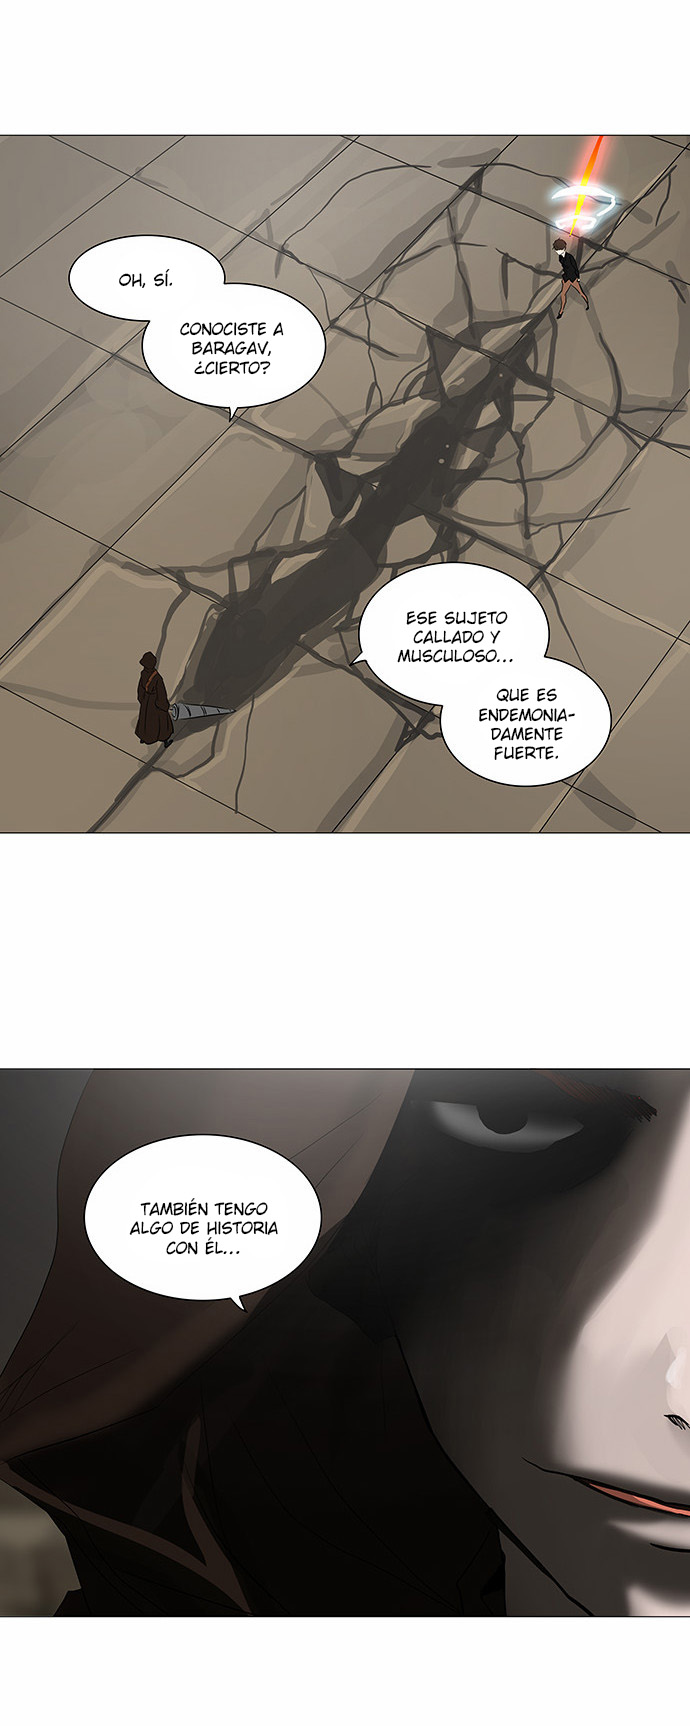 http://c5.ninemanga.com/es_manga/21/149/365457/8efada2b3d4c7acb1a733be531121ac7.jpg Page 11